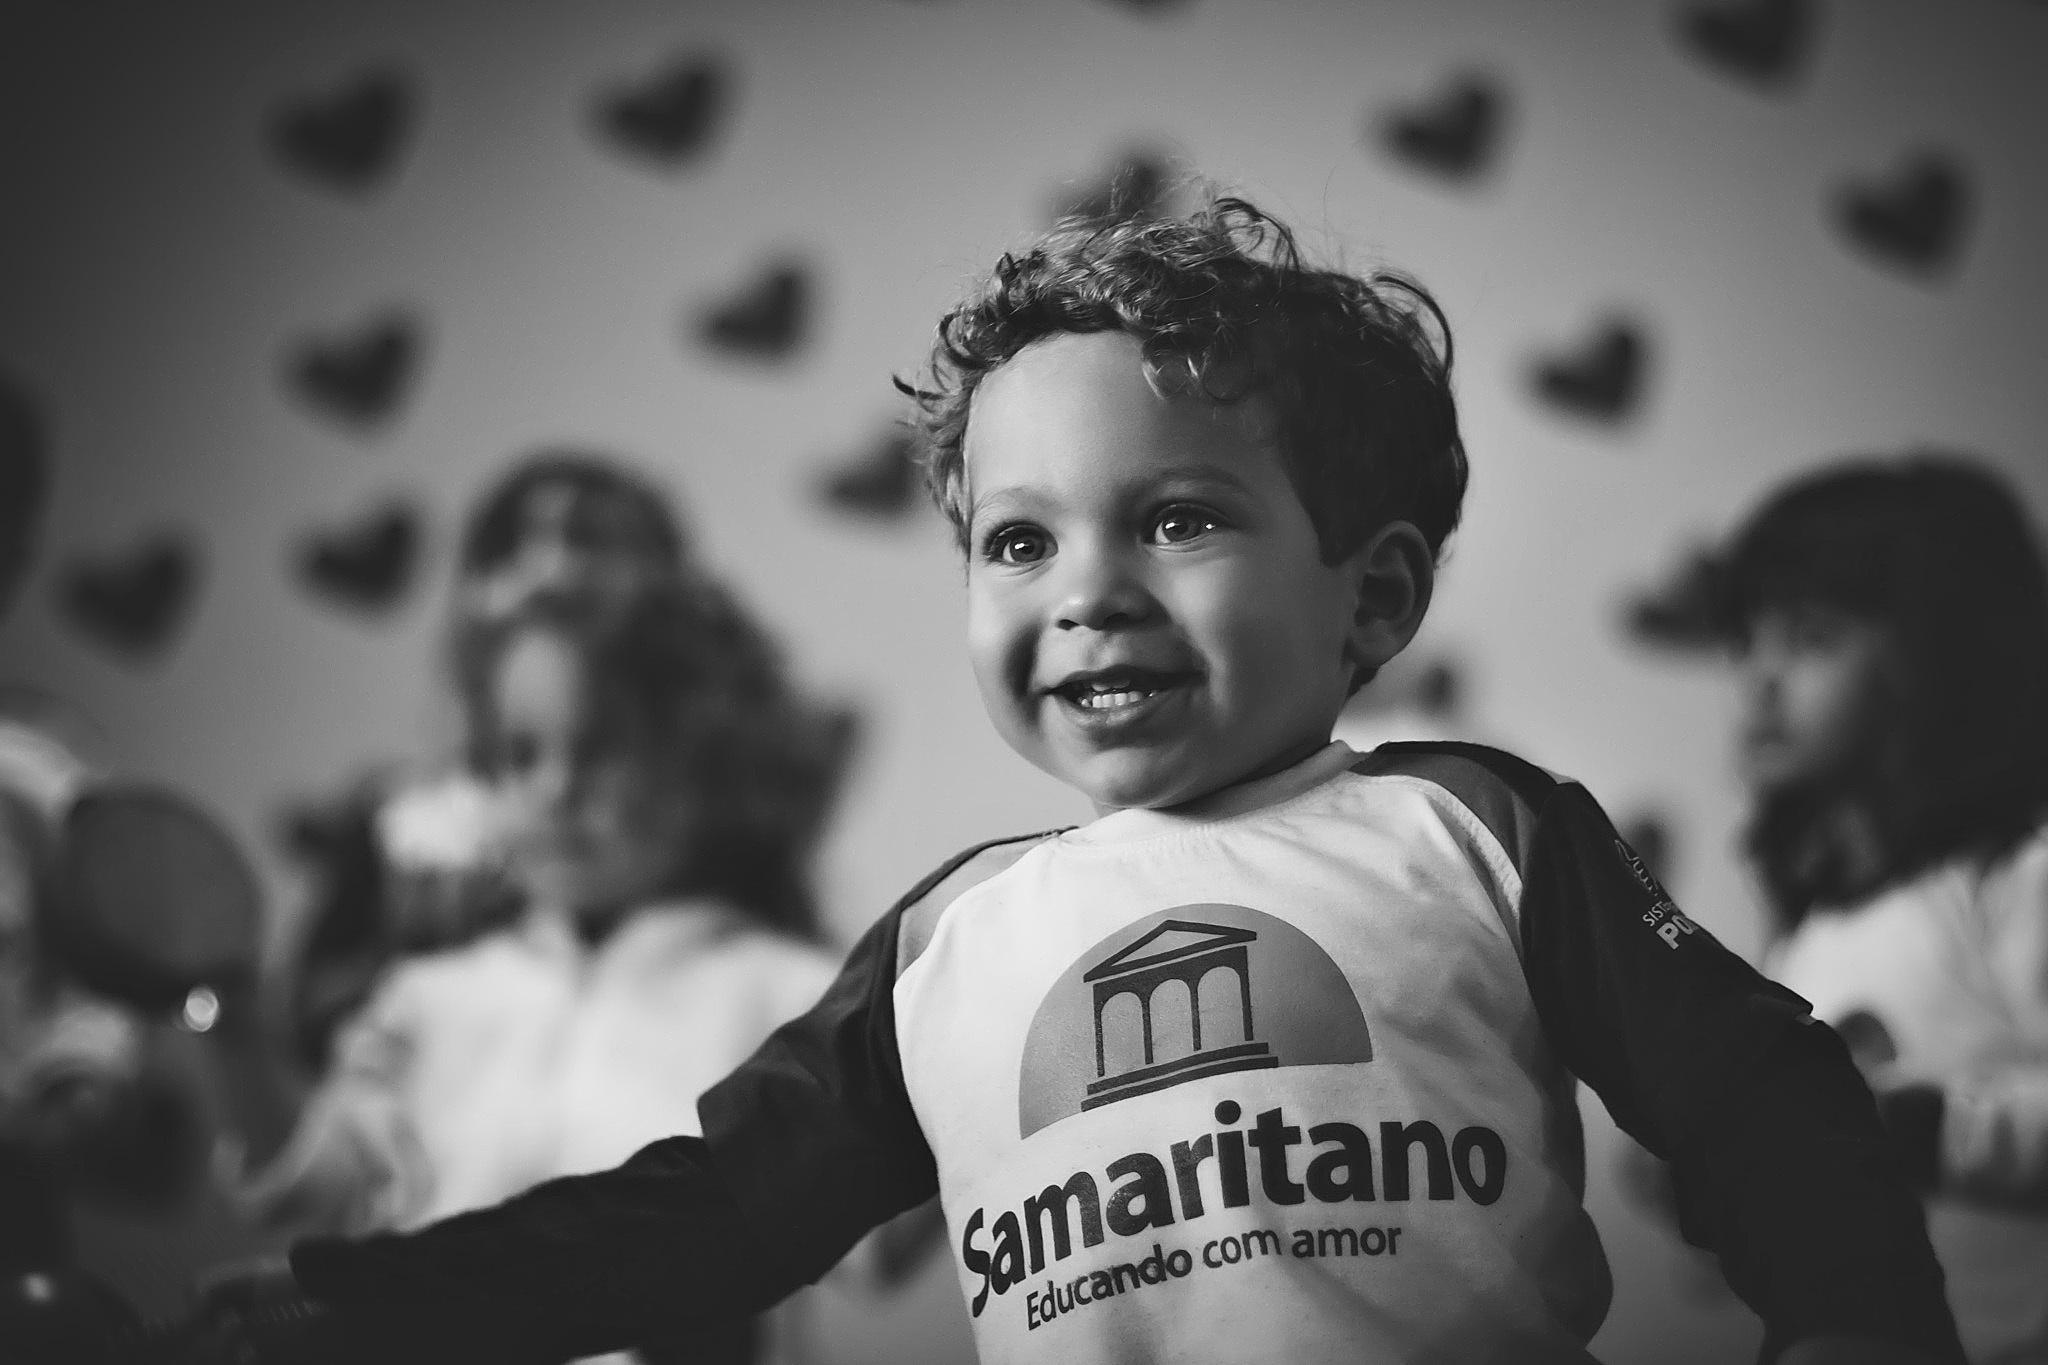 Sobre www.institutosamaritano.com.br